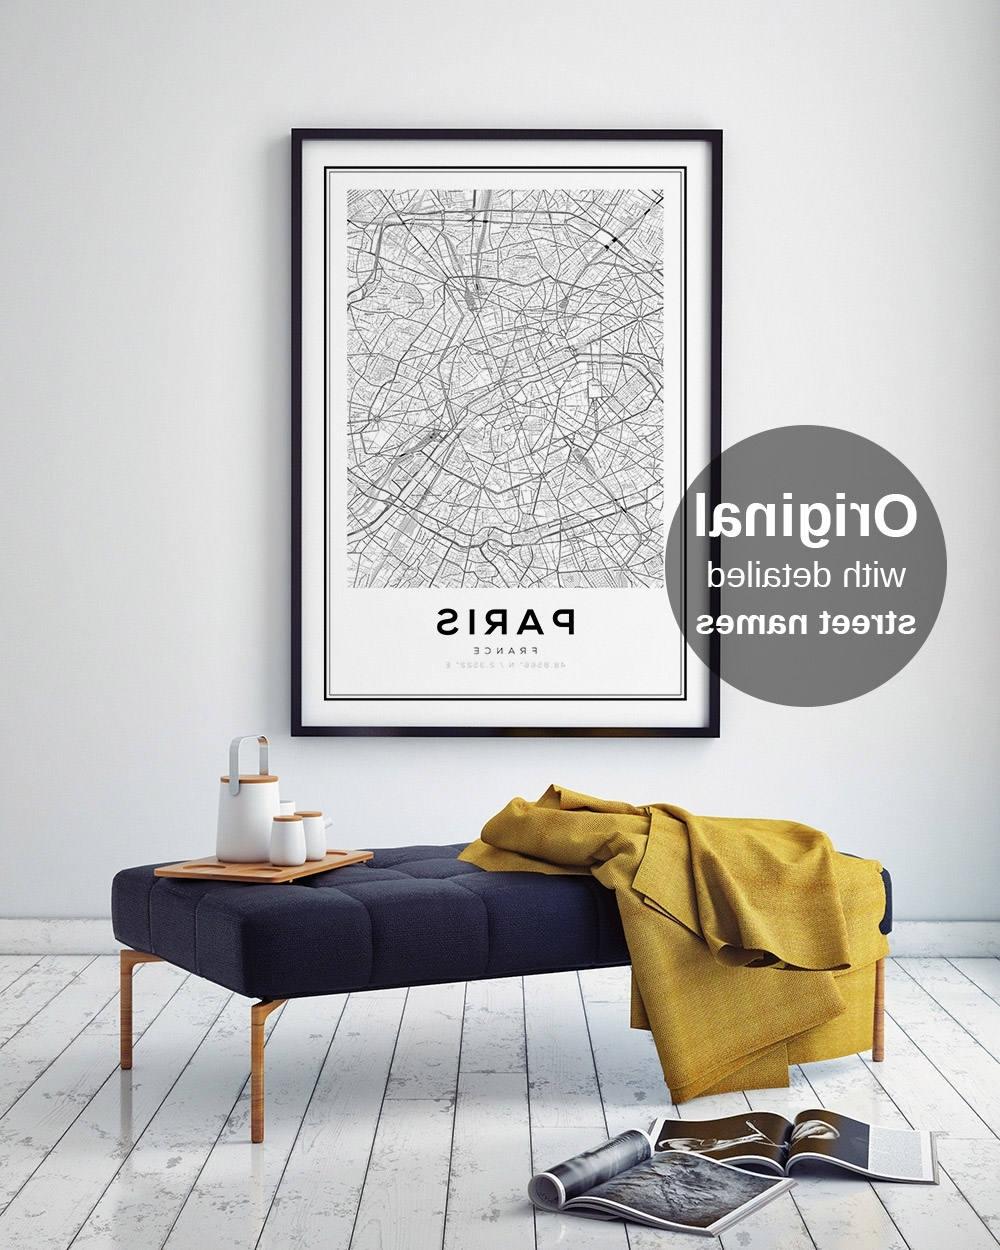 Paris Map Print, Paris Carte, Paris City, Paris Map Poster, France Within Well Liked Map Of Paris Wall Art (View 10 of 15)